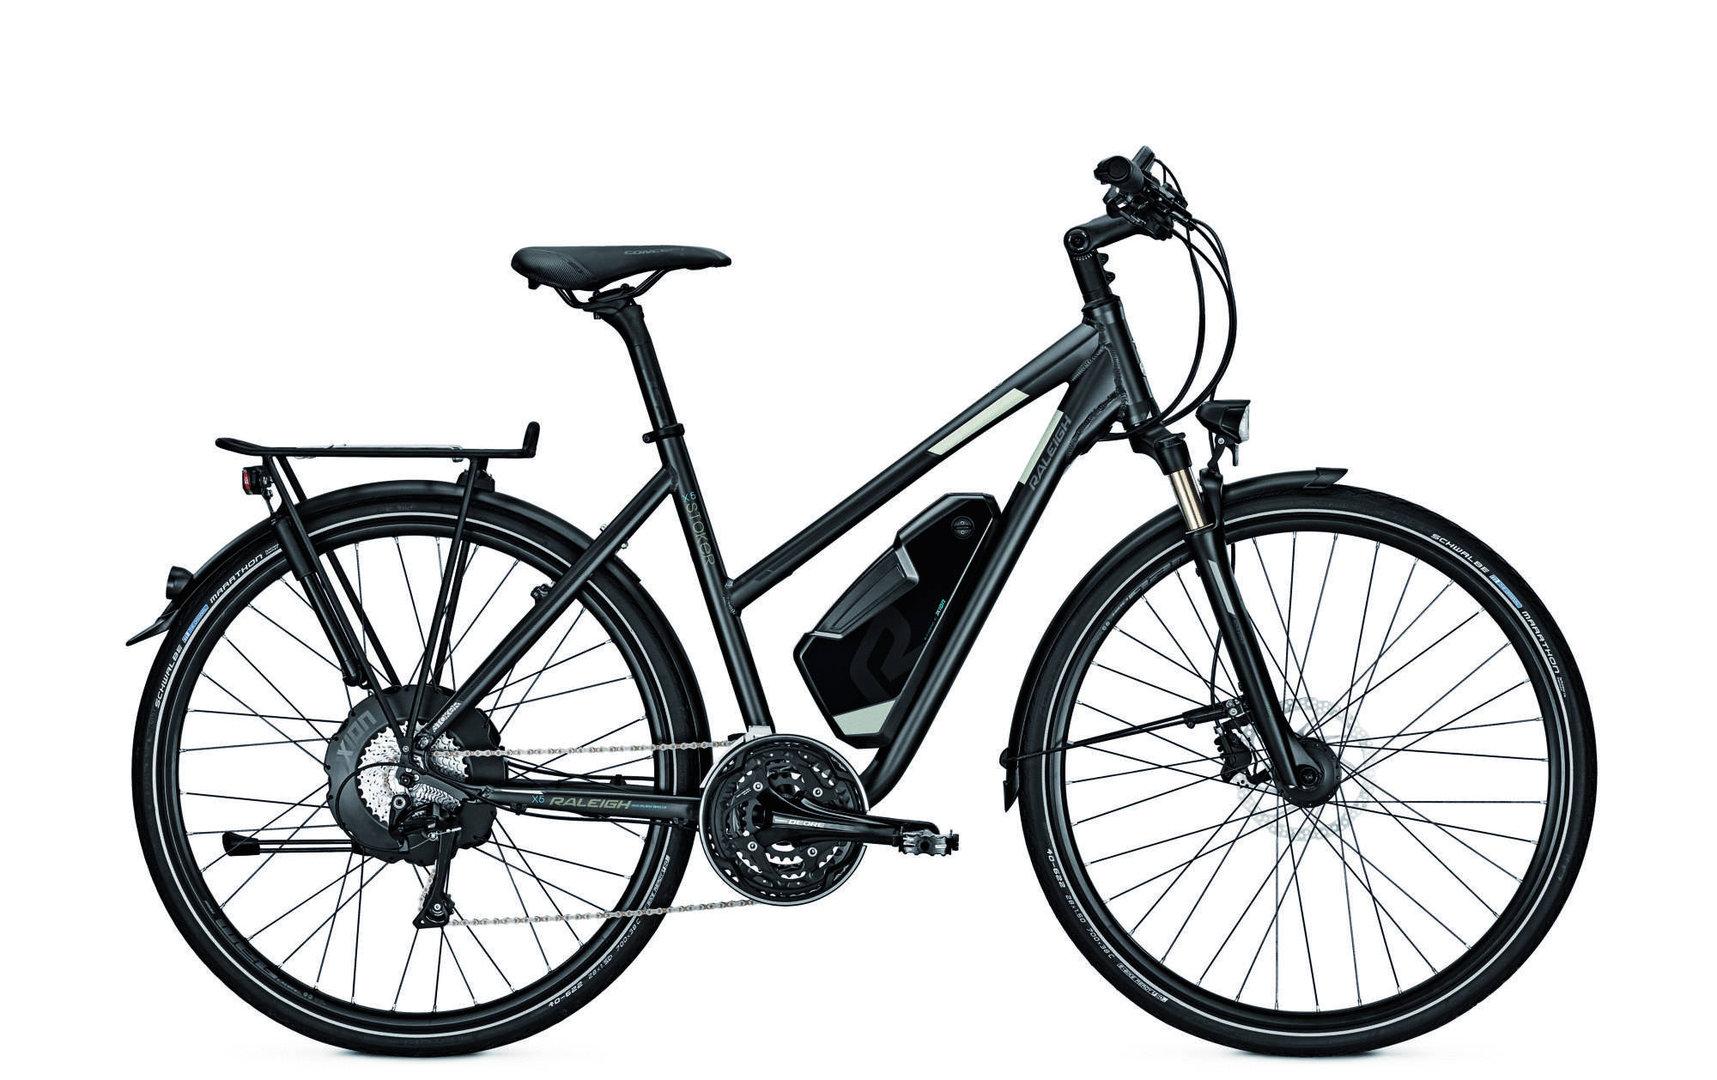 raleigh stoker x5 elektro fahrrad trekking ebike 2017. Black Bedroom Furniture Sets. Home Design Ideas